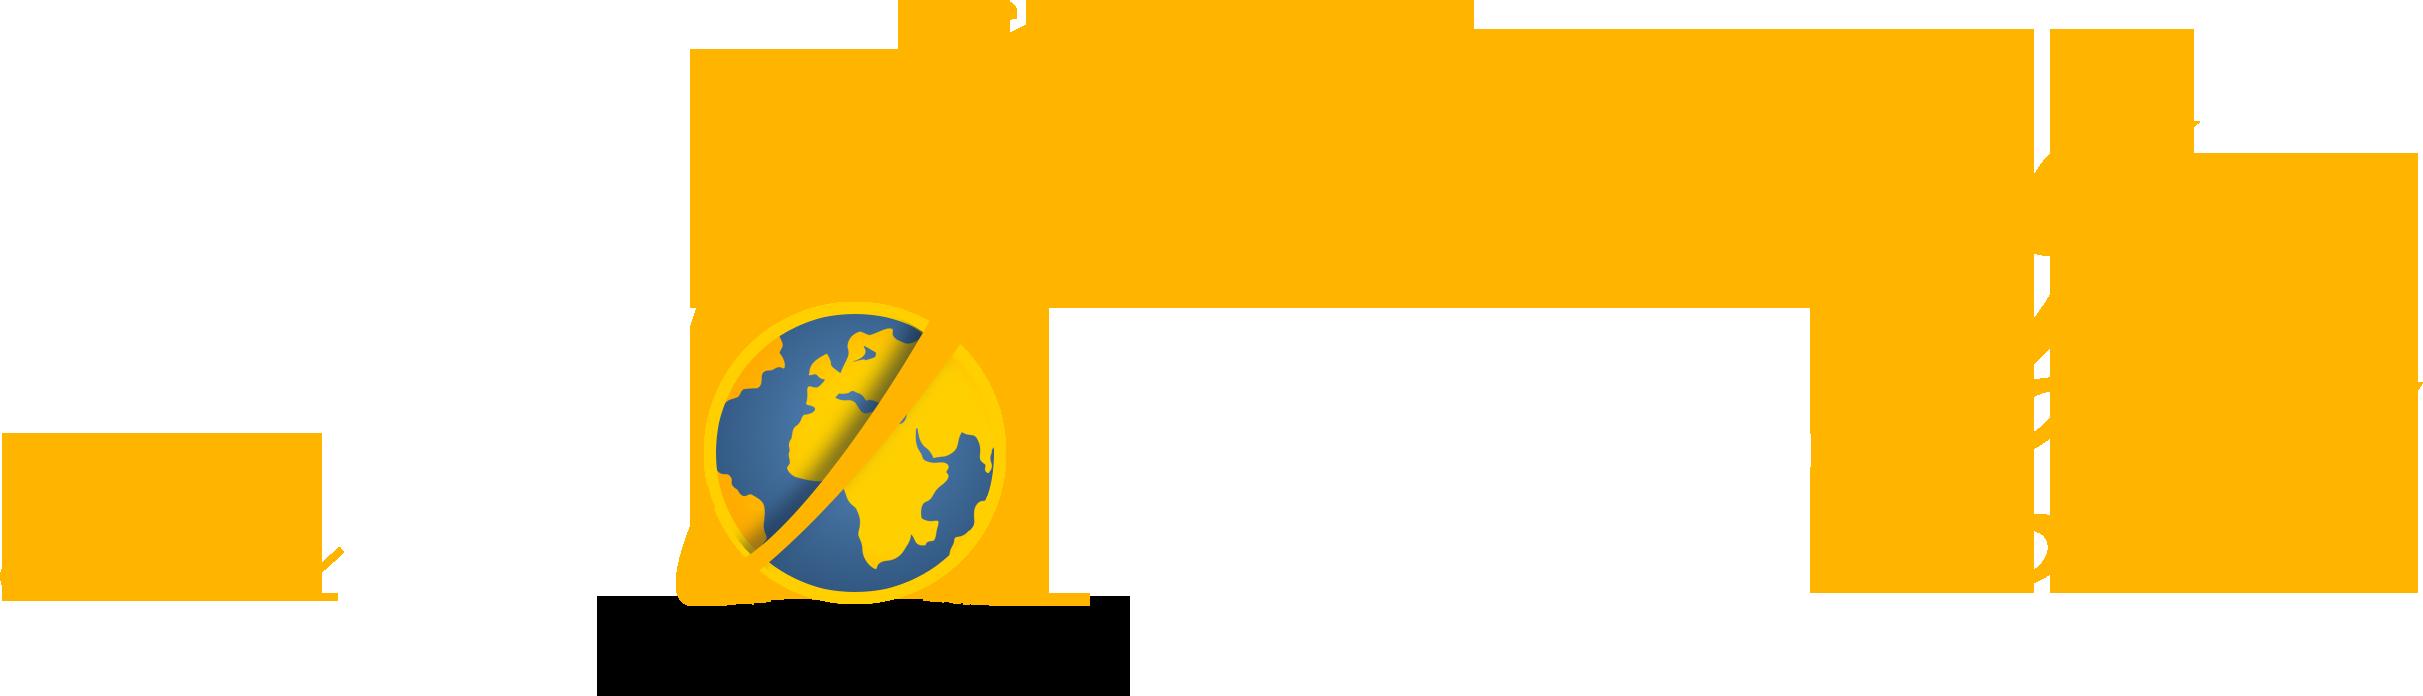 Australian Gambling List | Top Online Gambling Sites 2021